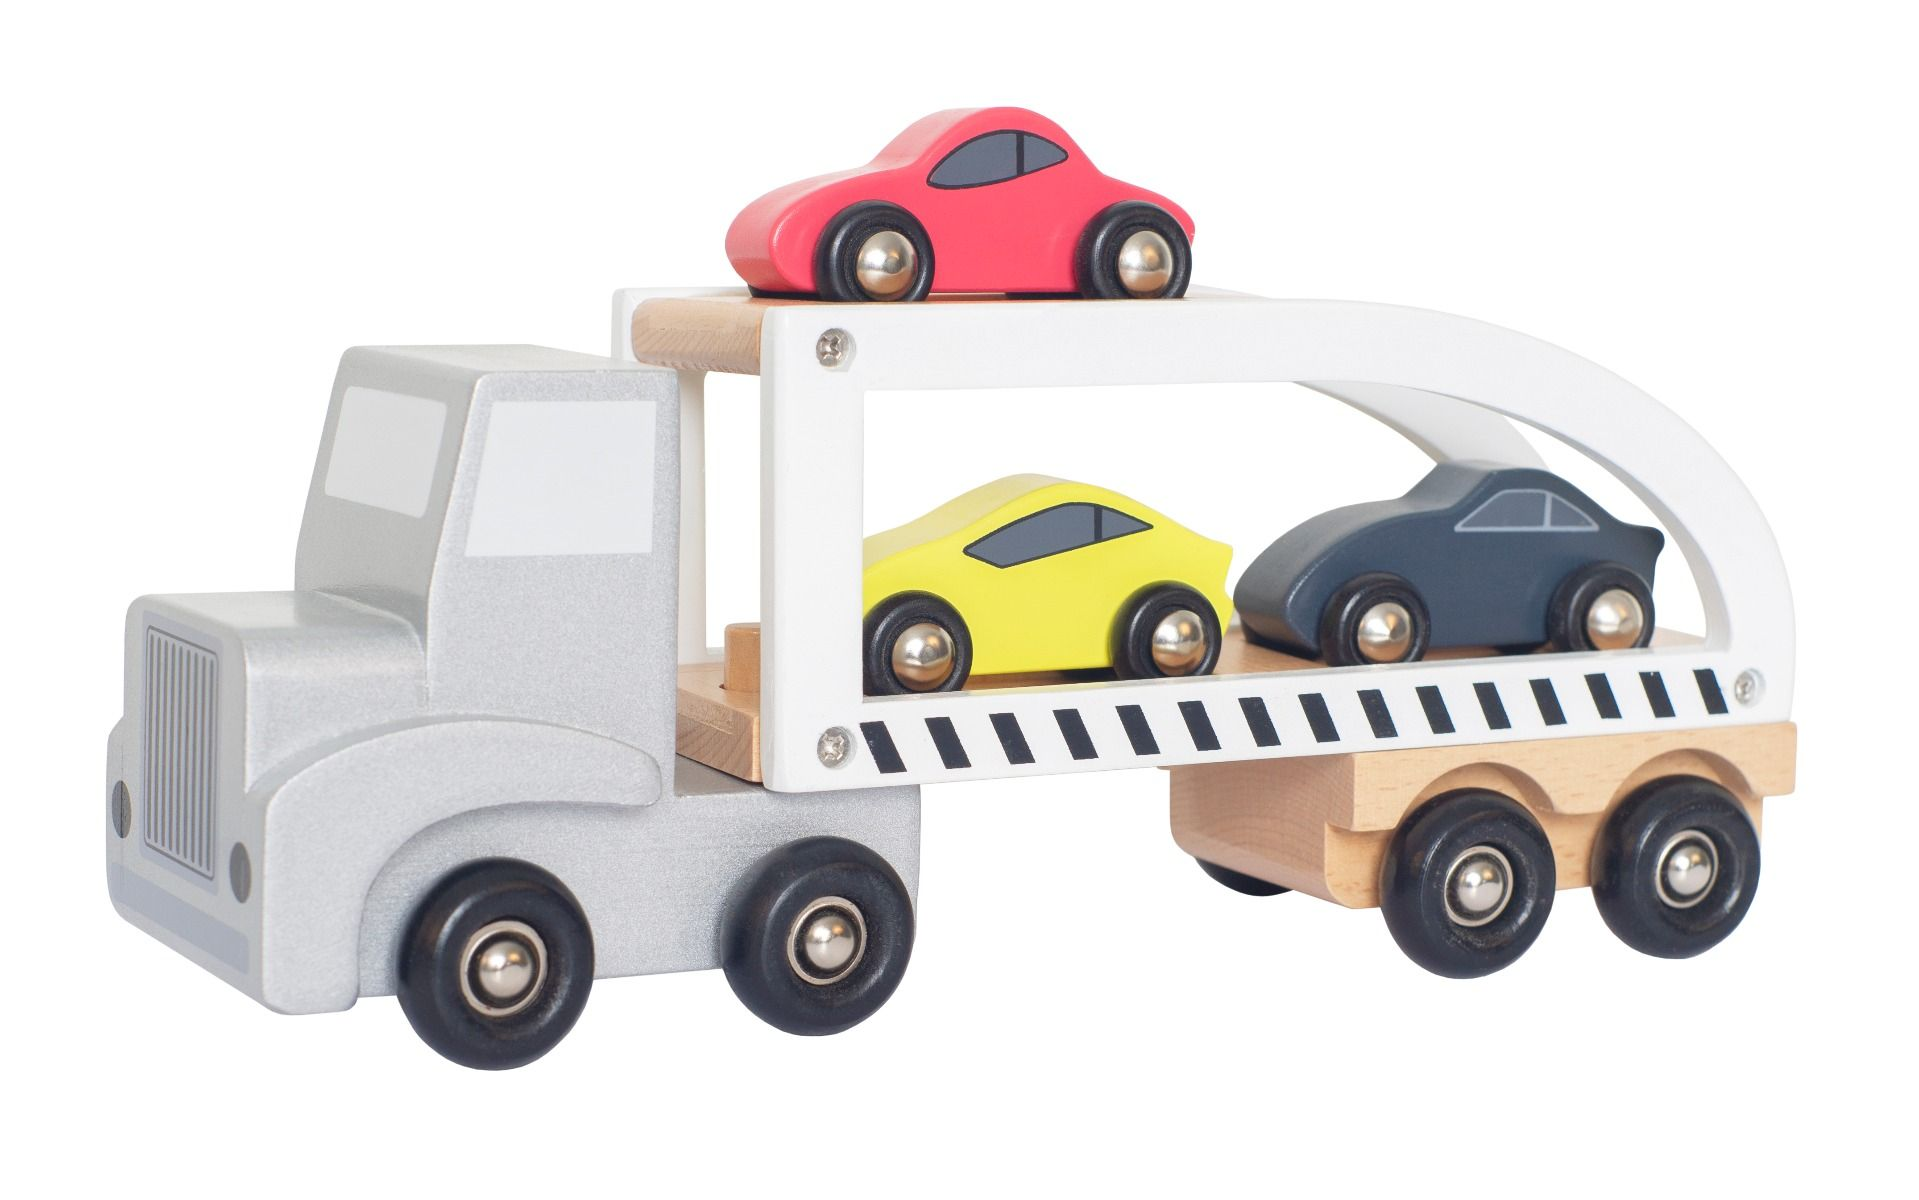 Holz Auto Truck Transporter mit Sportautos